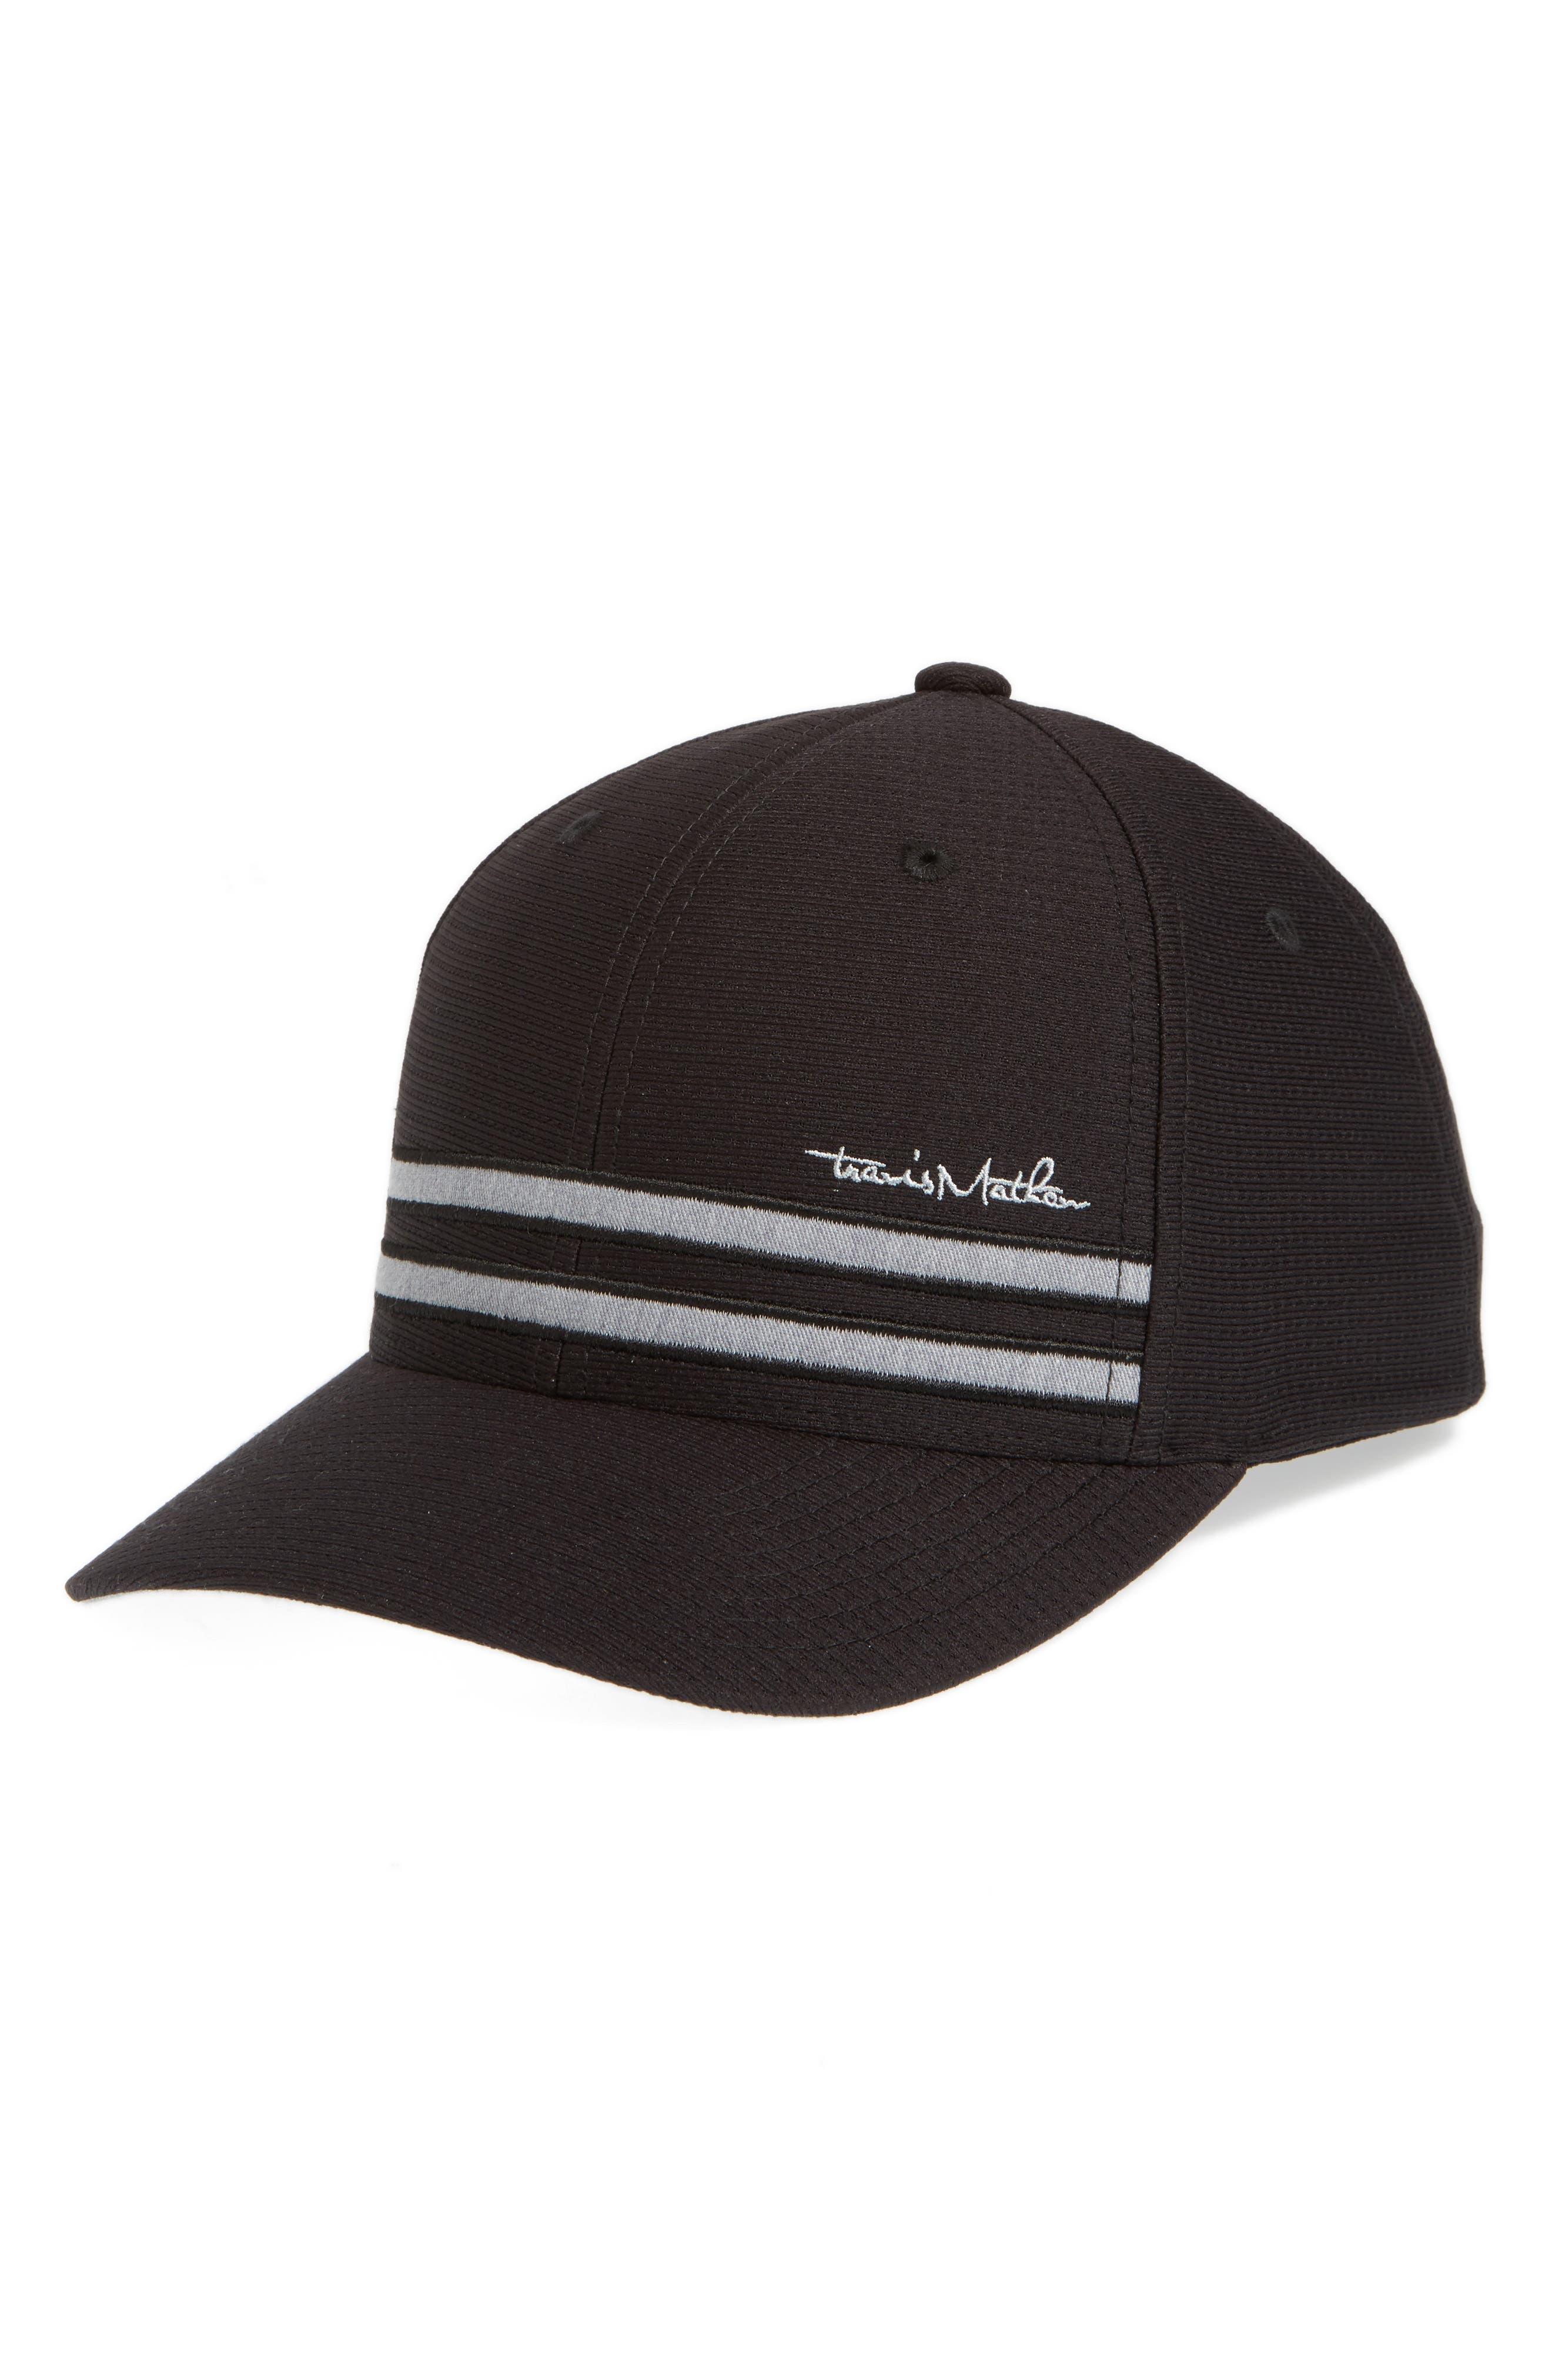 TRAVIS MATHEW Hout Golfer Cap